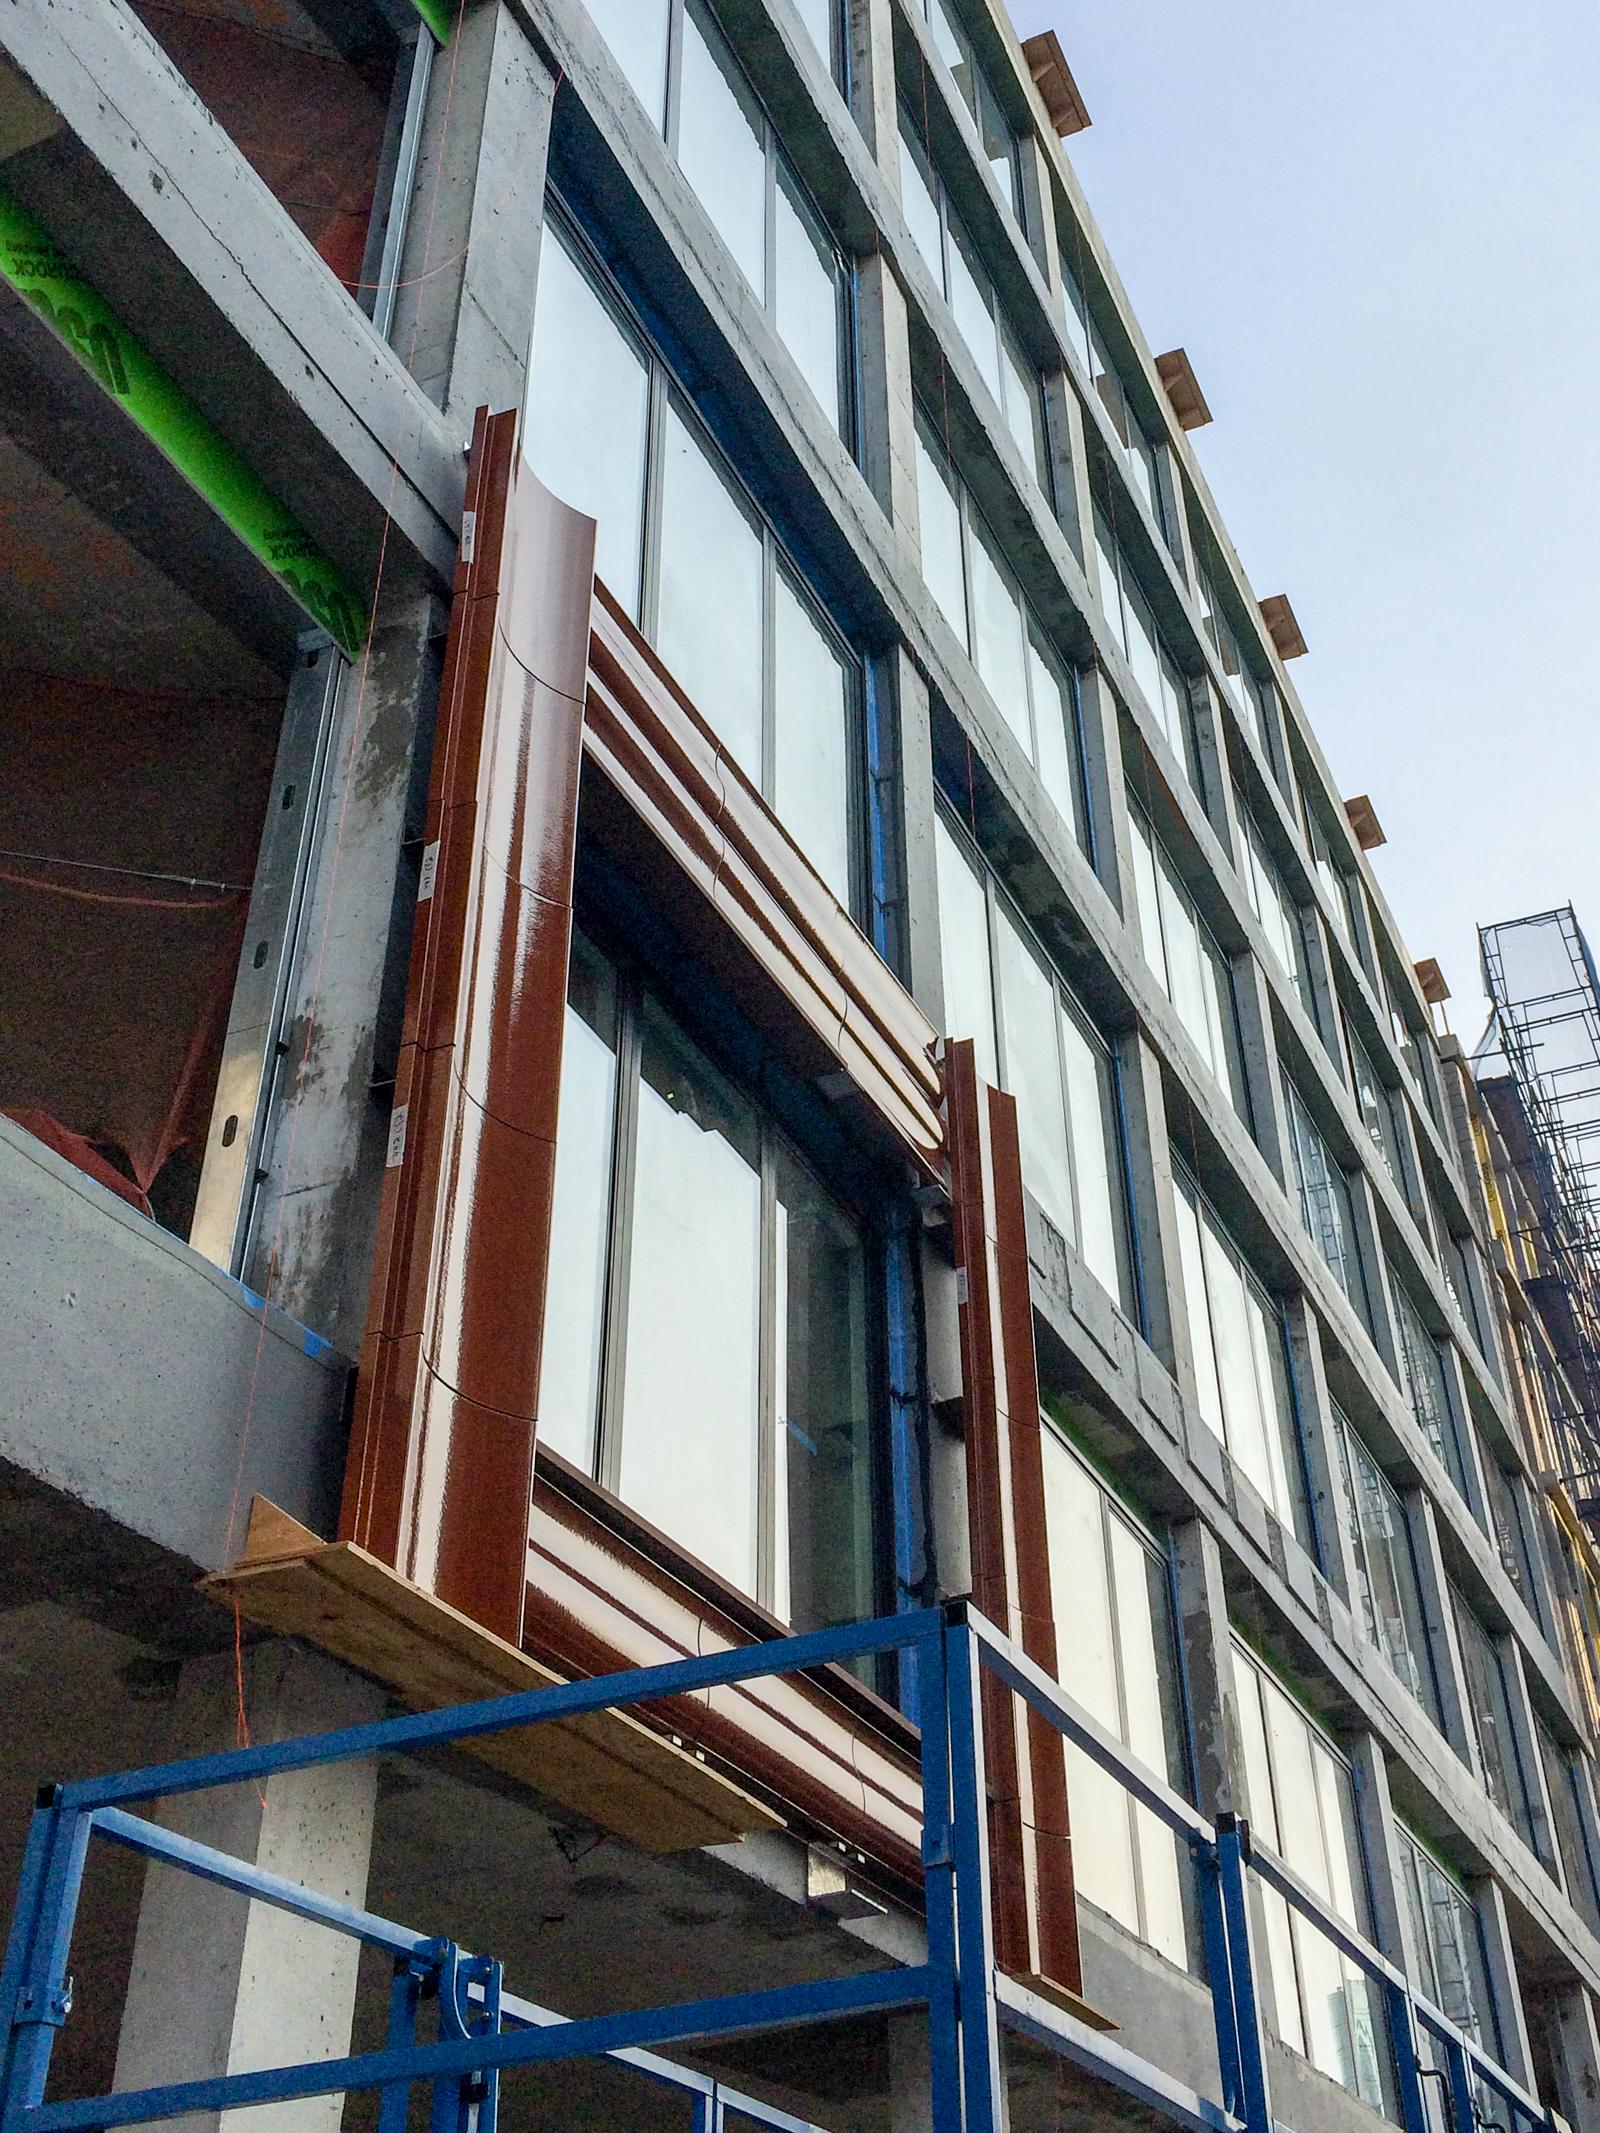 Terracotta panels installedaround a second floor window.